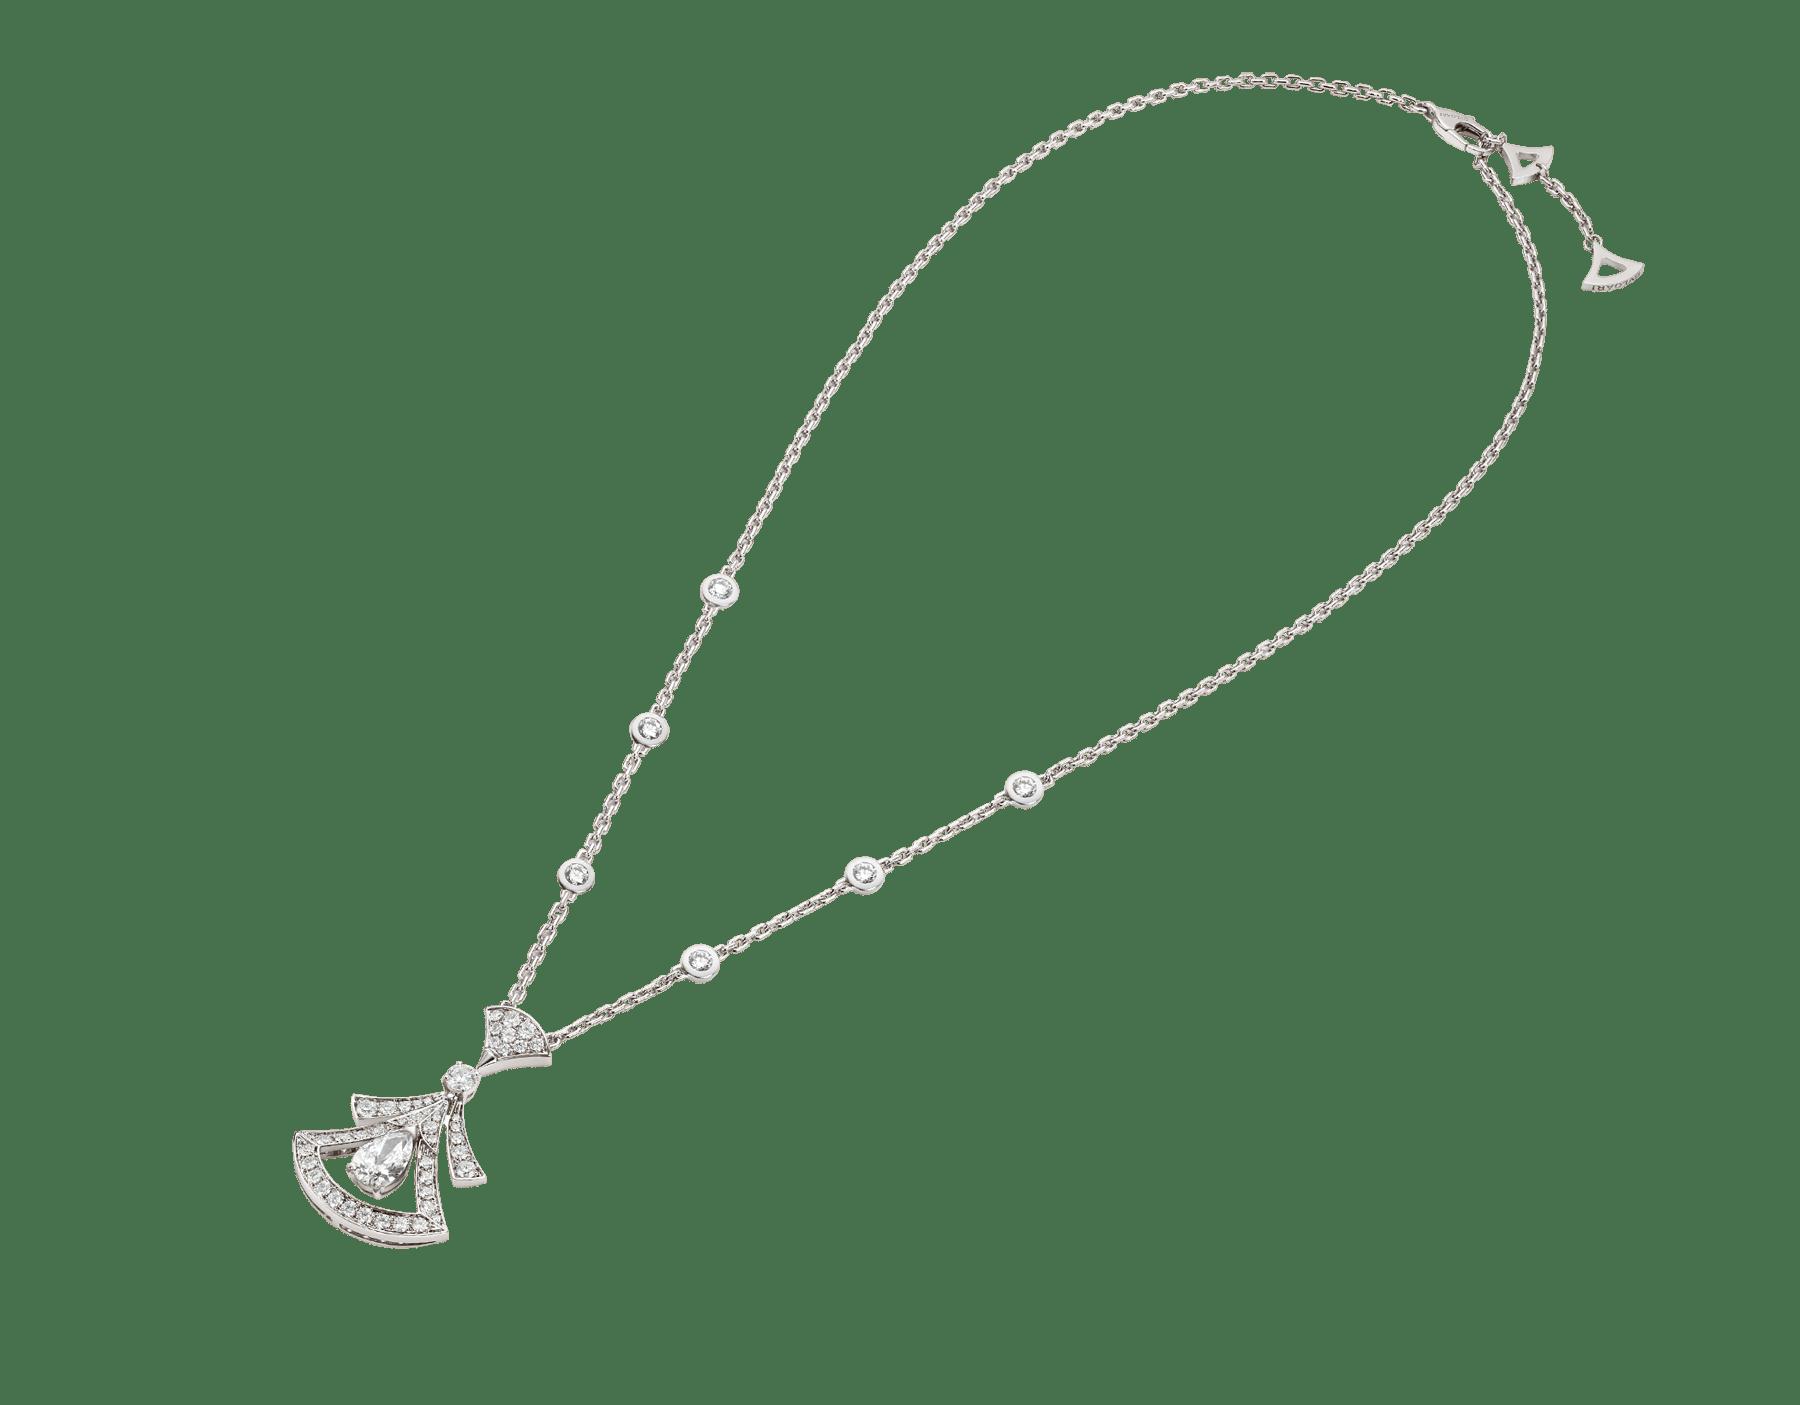 Divas' Dream 18K 白金項鍊,鑲飾 1 顆梨形鑽石(0.80 克拉)、圓形明亮型切割鑽石(0.77 克拉)和密鑲鑽石(0.71 克拉)。 358220 image 2